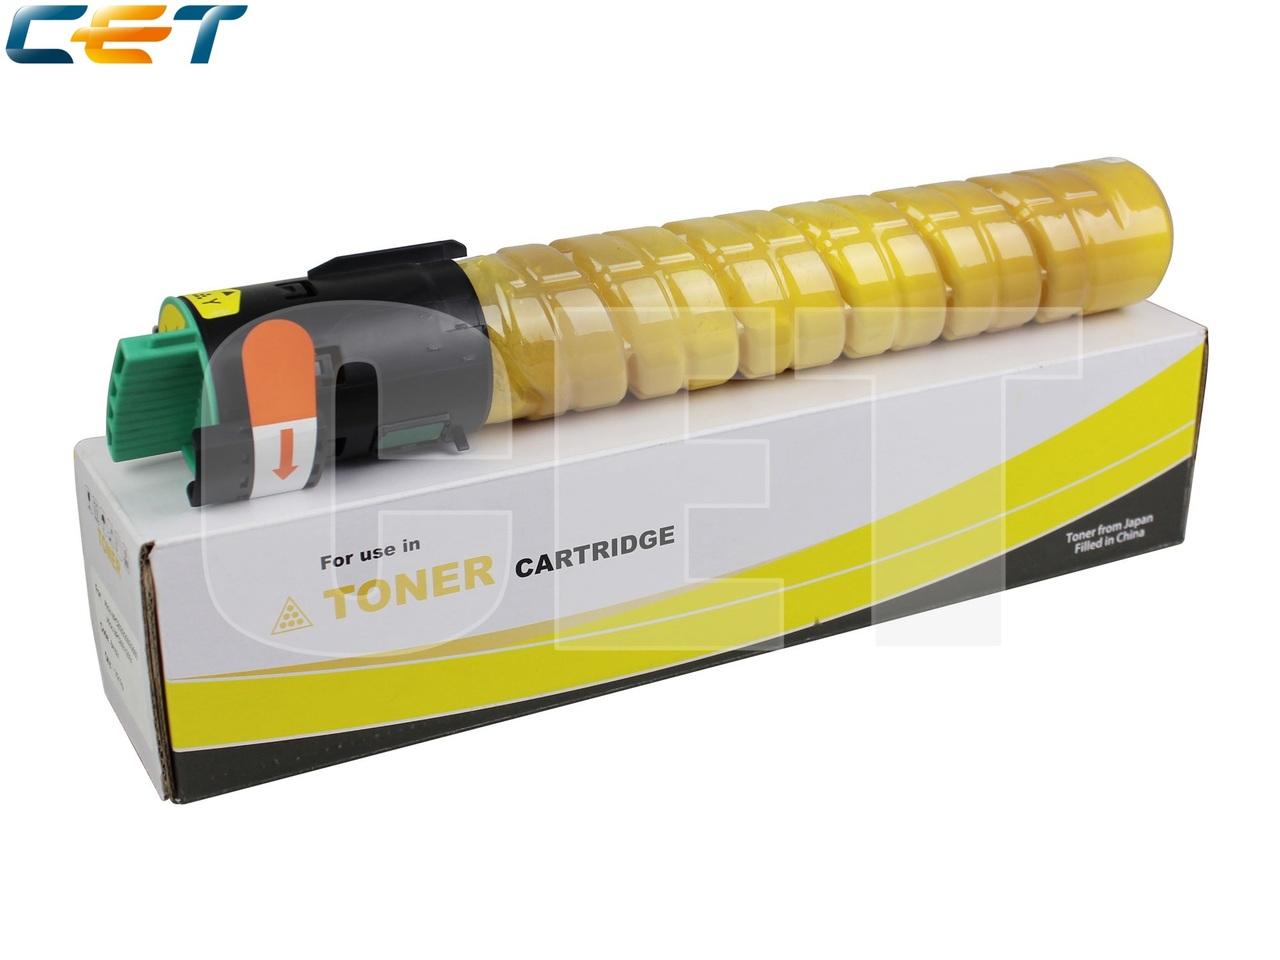 Тонер-картридж (Type 516) 841507 для RICOH AficioMPC2551/MPC2051/MPC2550/MPC2050/MPC2030 (CET) Yellow,215г, 9500 стр., CET6463